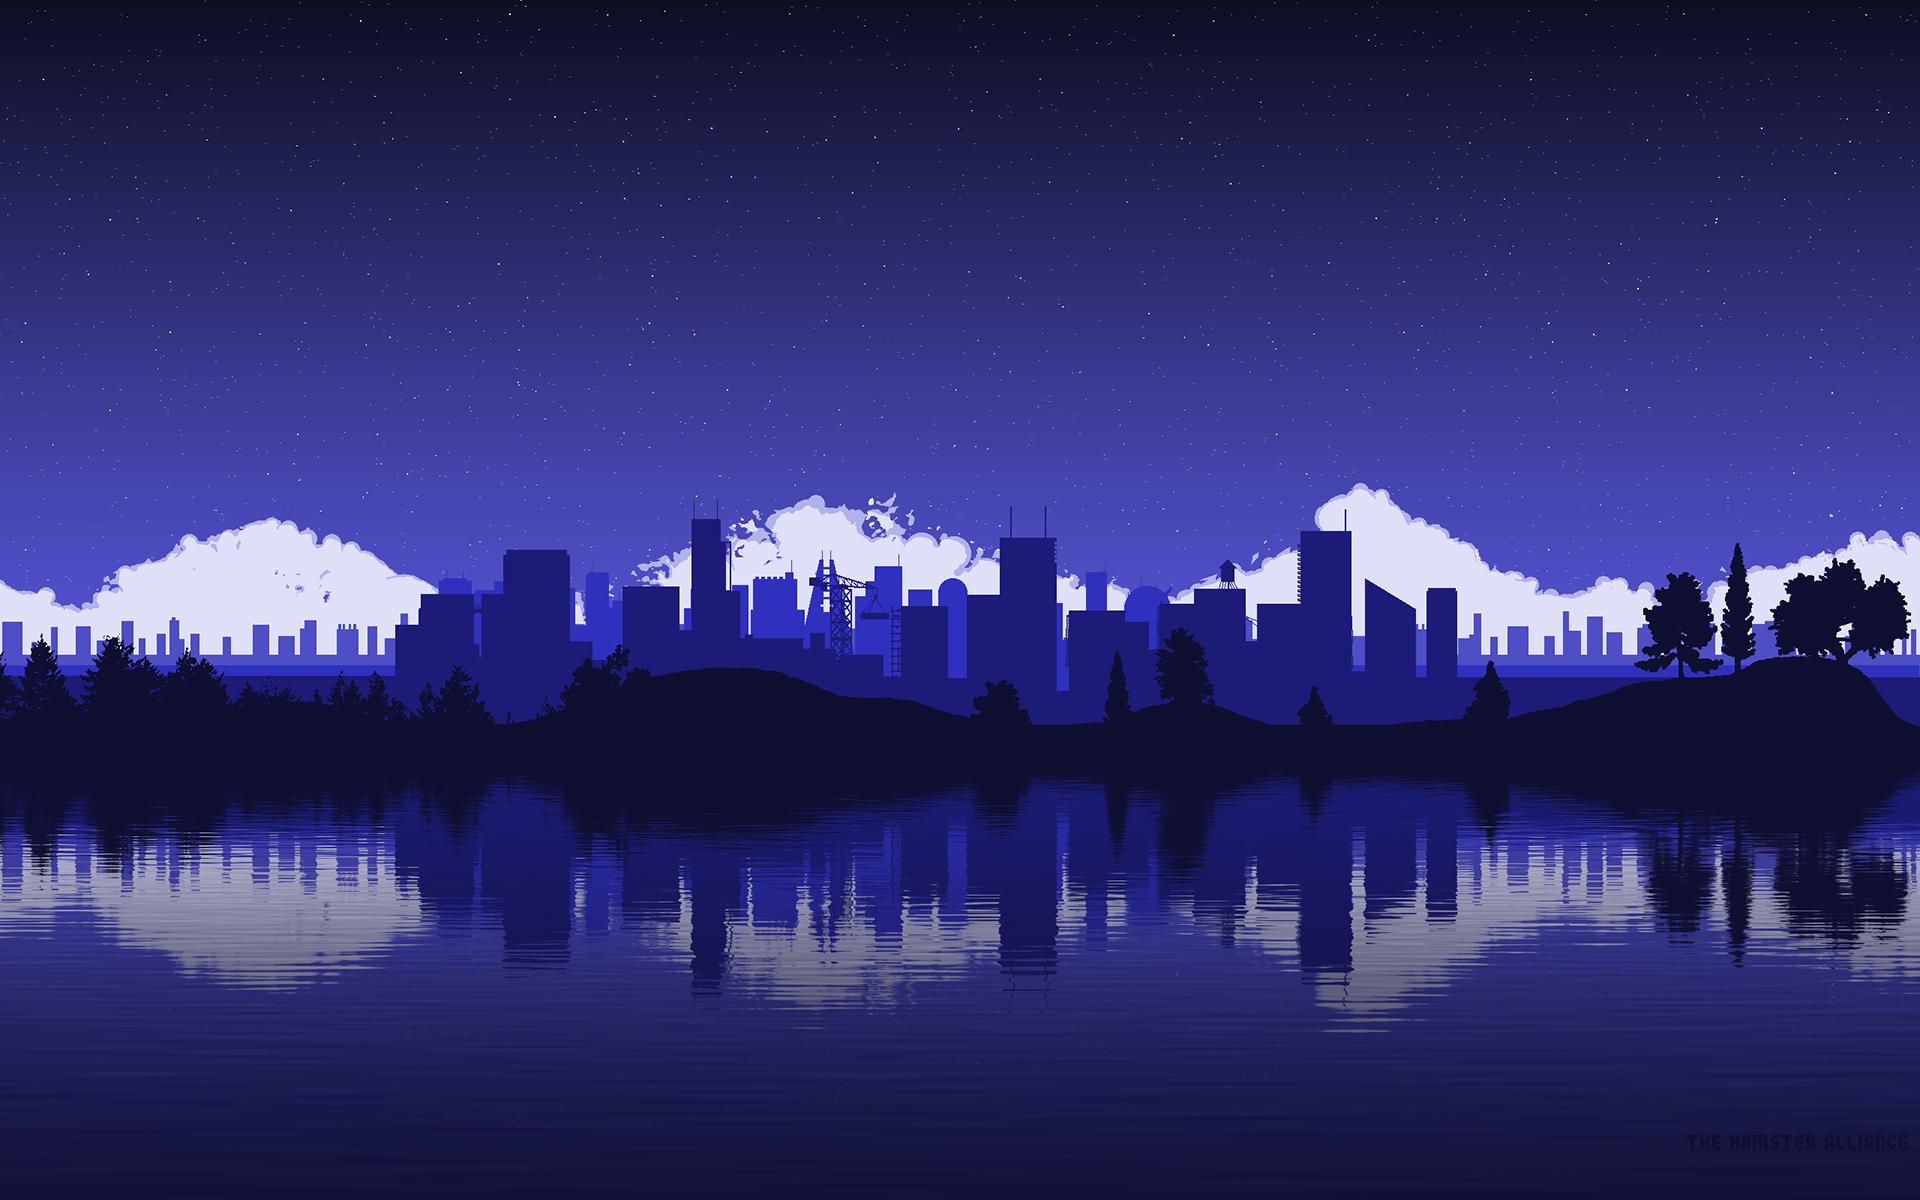 [48+] Wallpaper Pixel Art on WallpaperSafari